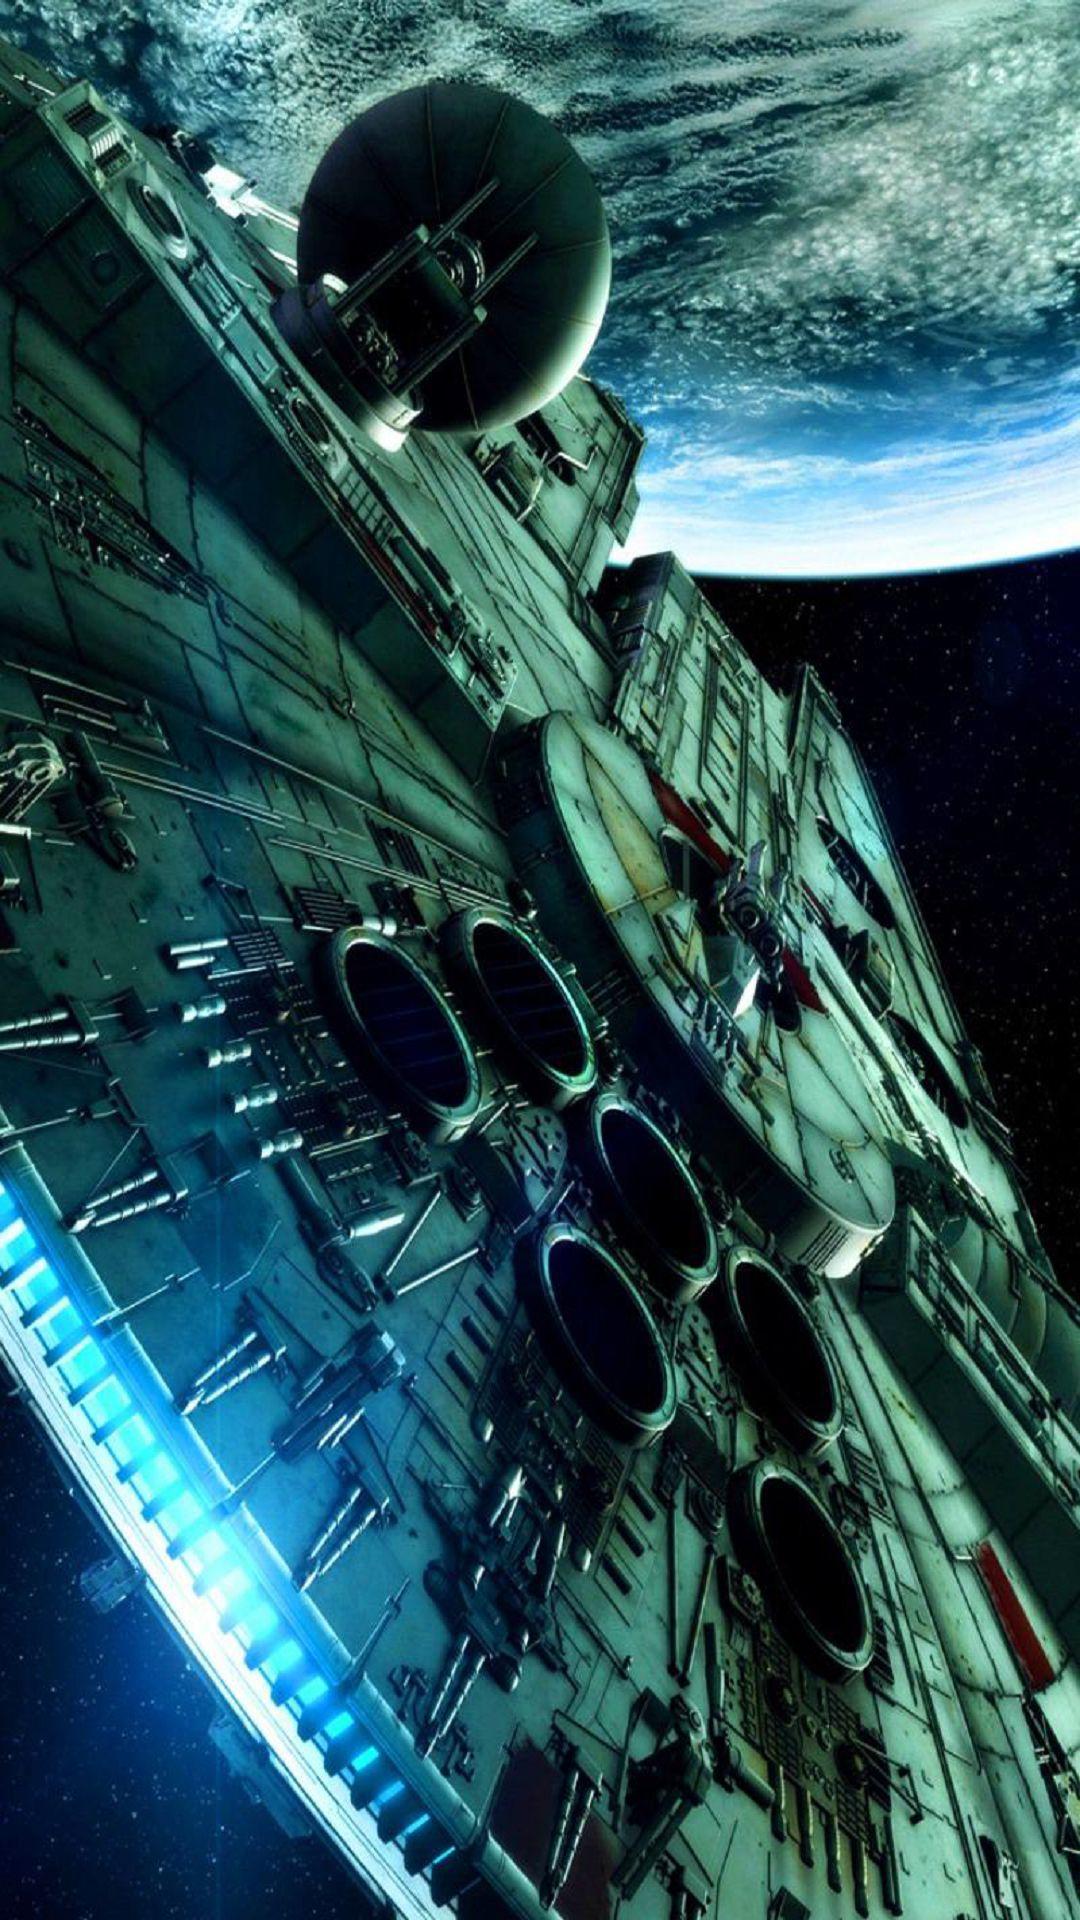 Star Wars Spaceship Science Fiction iPhone 6 Plus HD Wallpaper 1080x1920